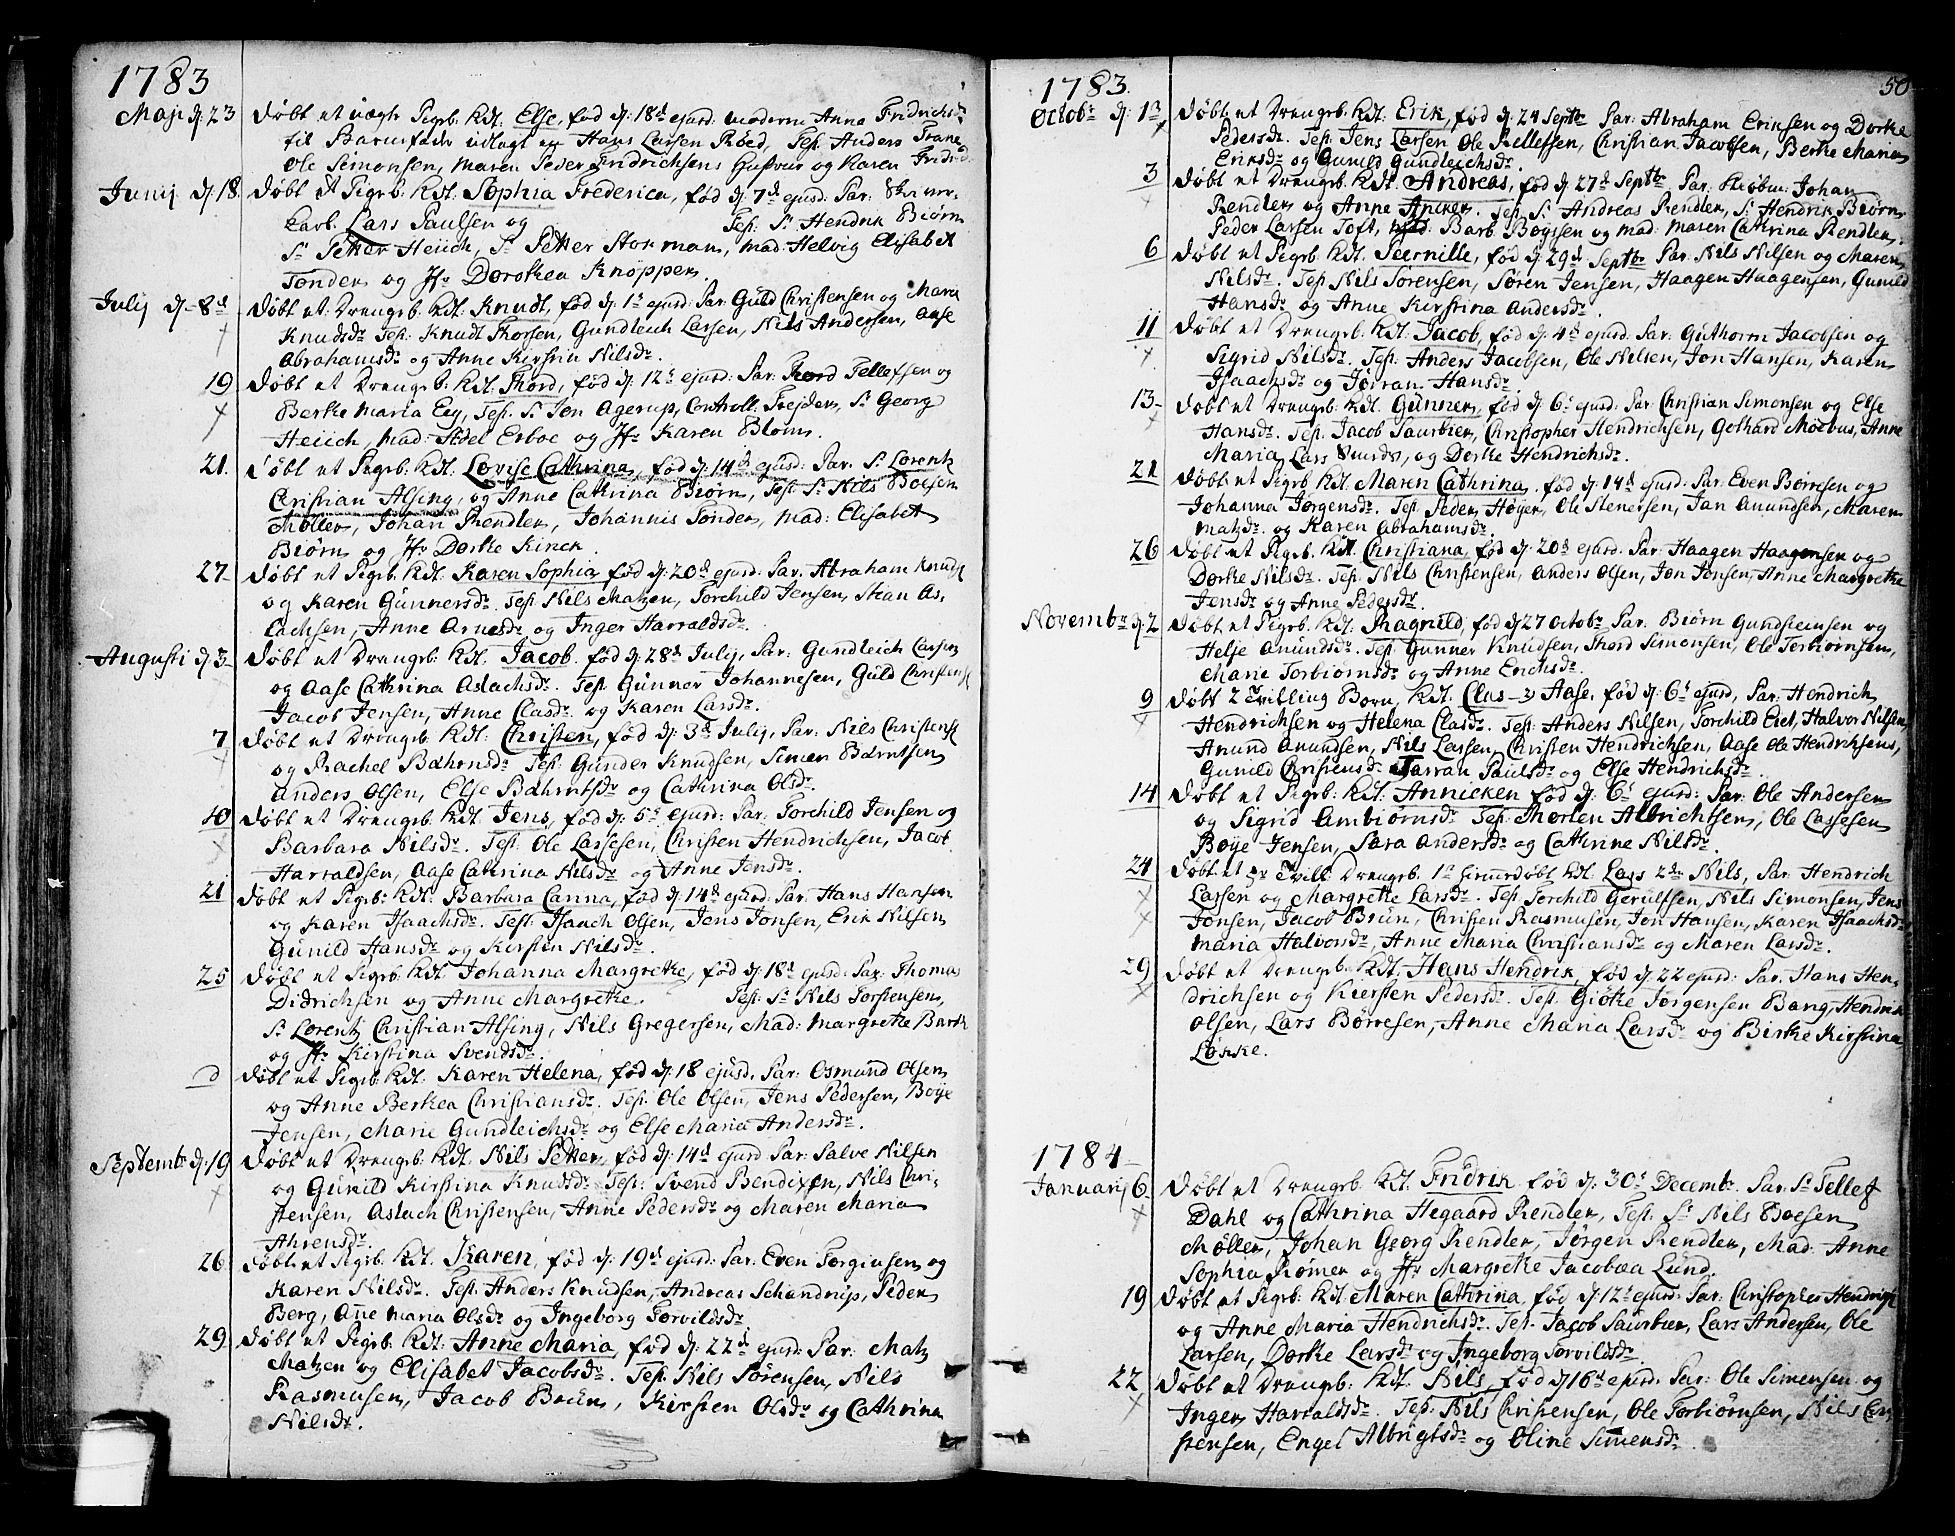 SAKO, Kragerø kirkebøker, F/Fa/L0002: Ministerialbok nr. 2, 1767-1802, s. 50